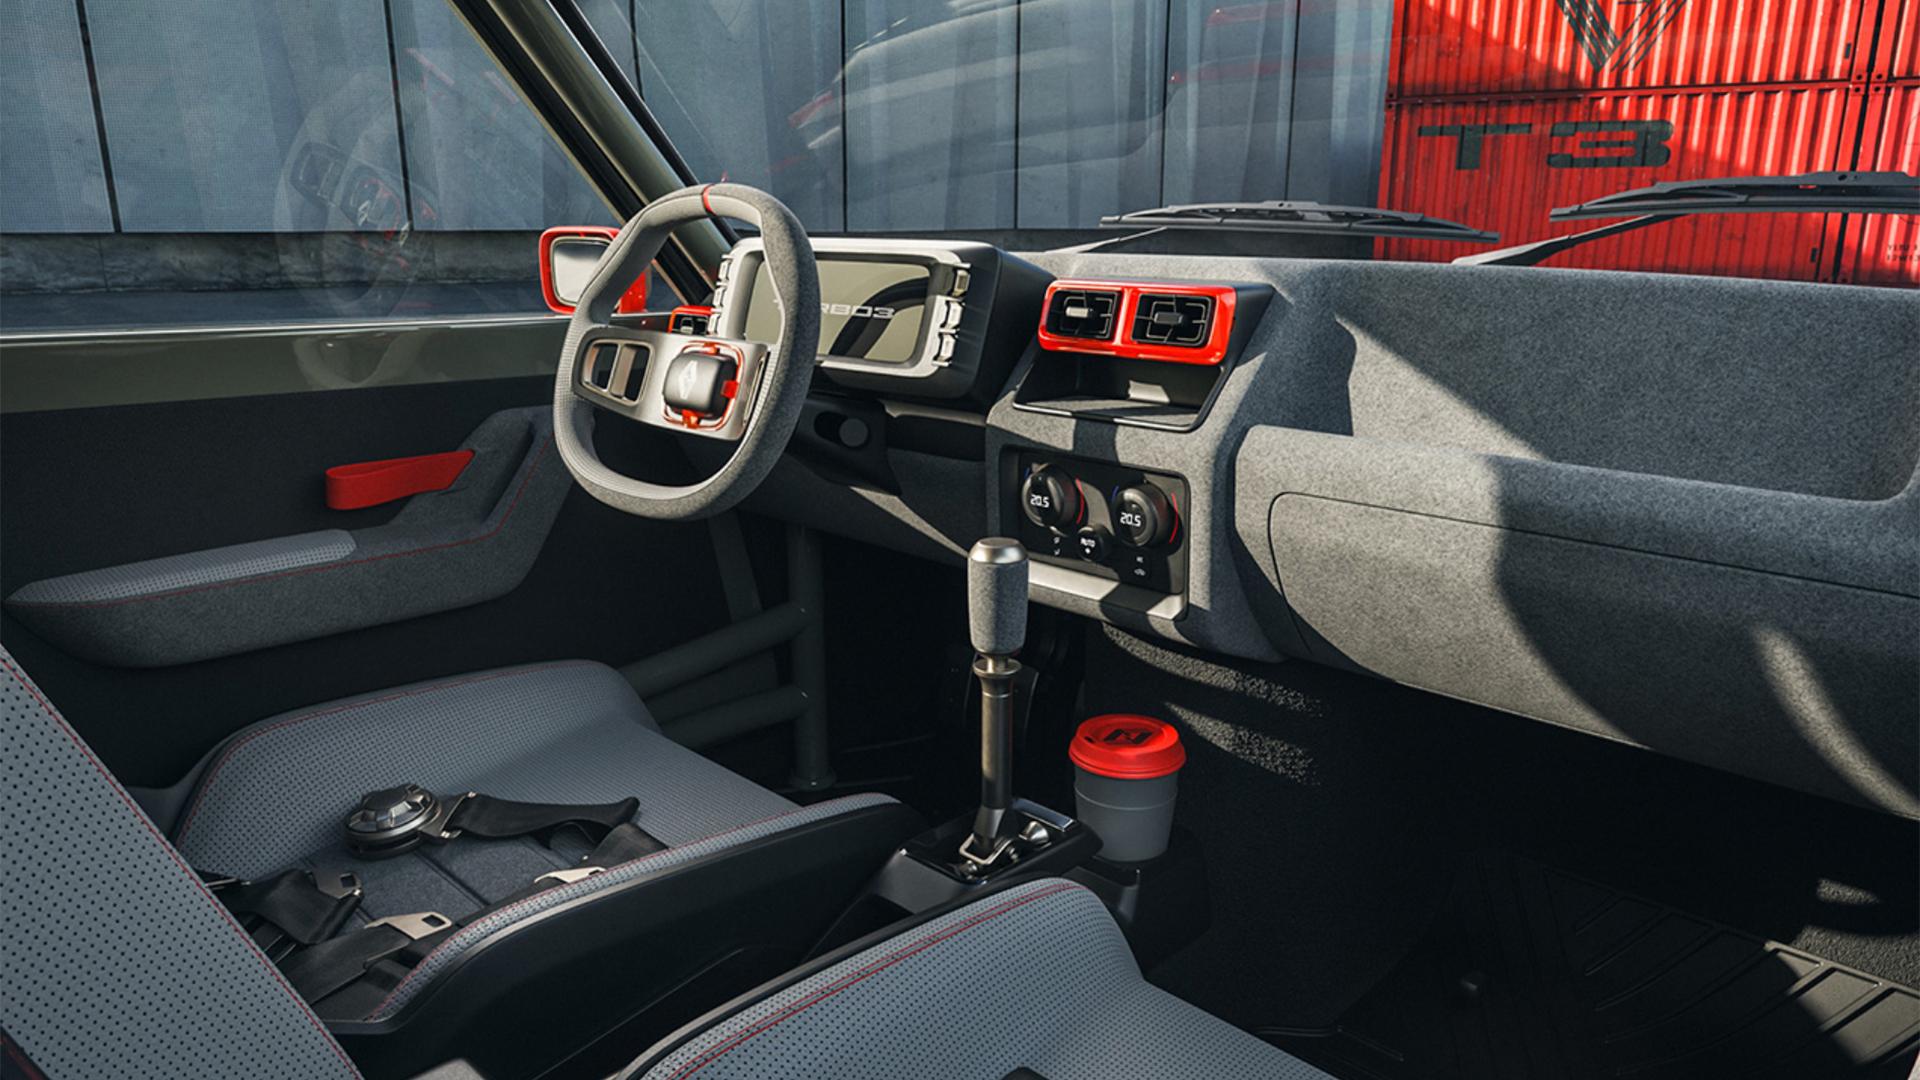 Renault 5 Turbo 3 by Legende Automobiles interior